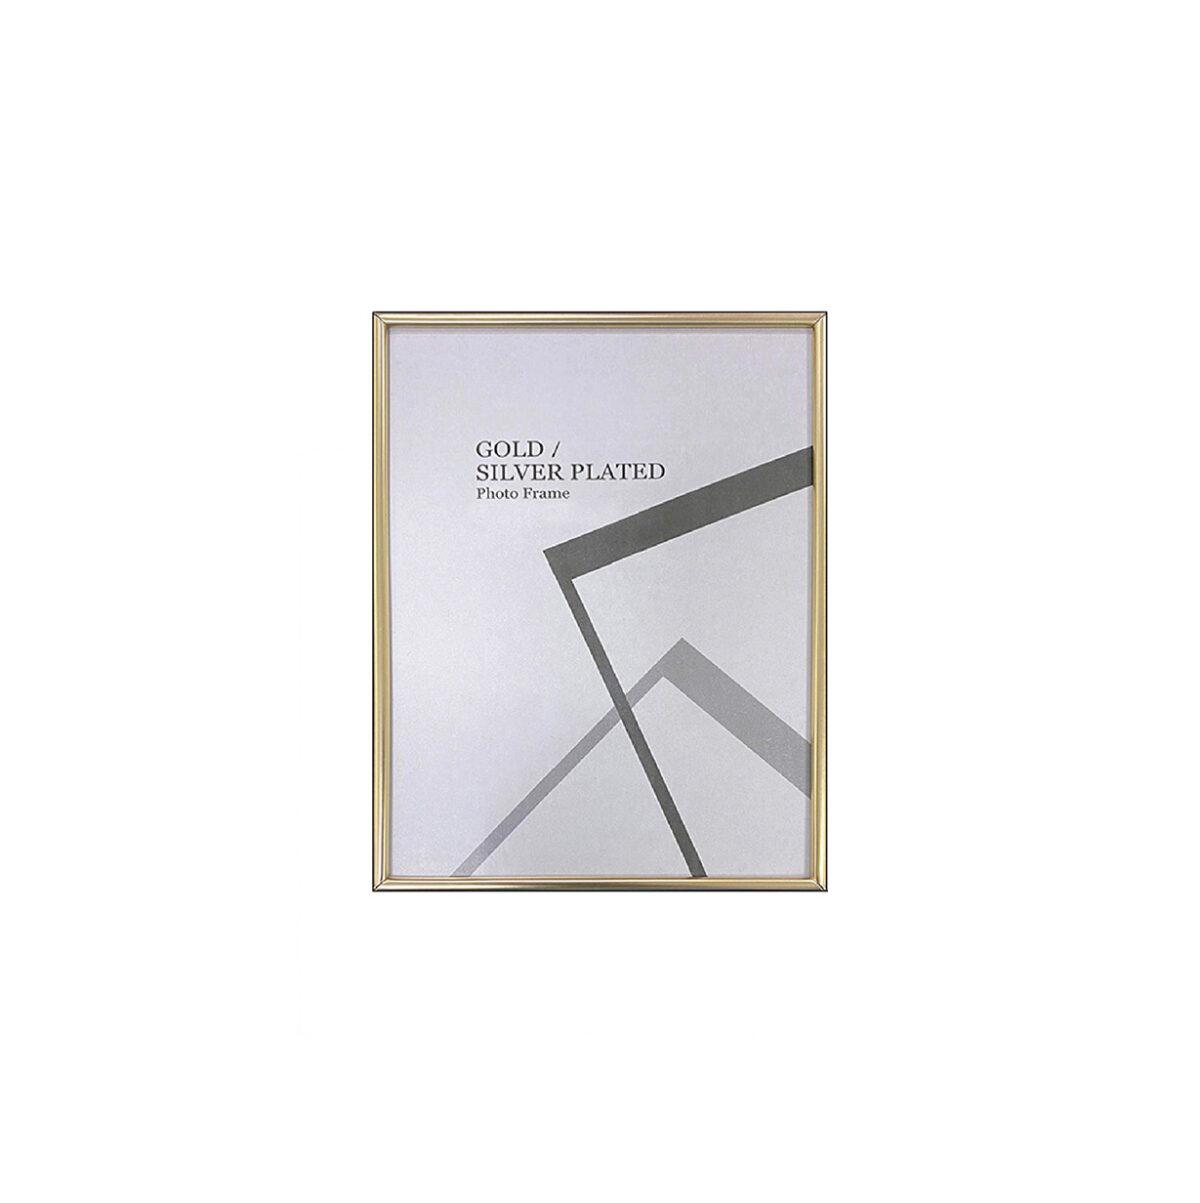 Centre Photo Frame / Picture Frame - Matte Gold 6R